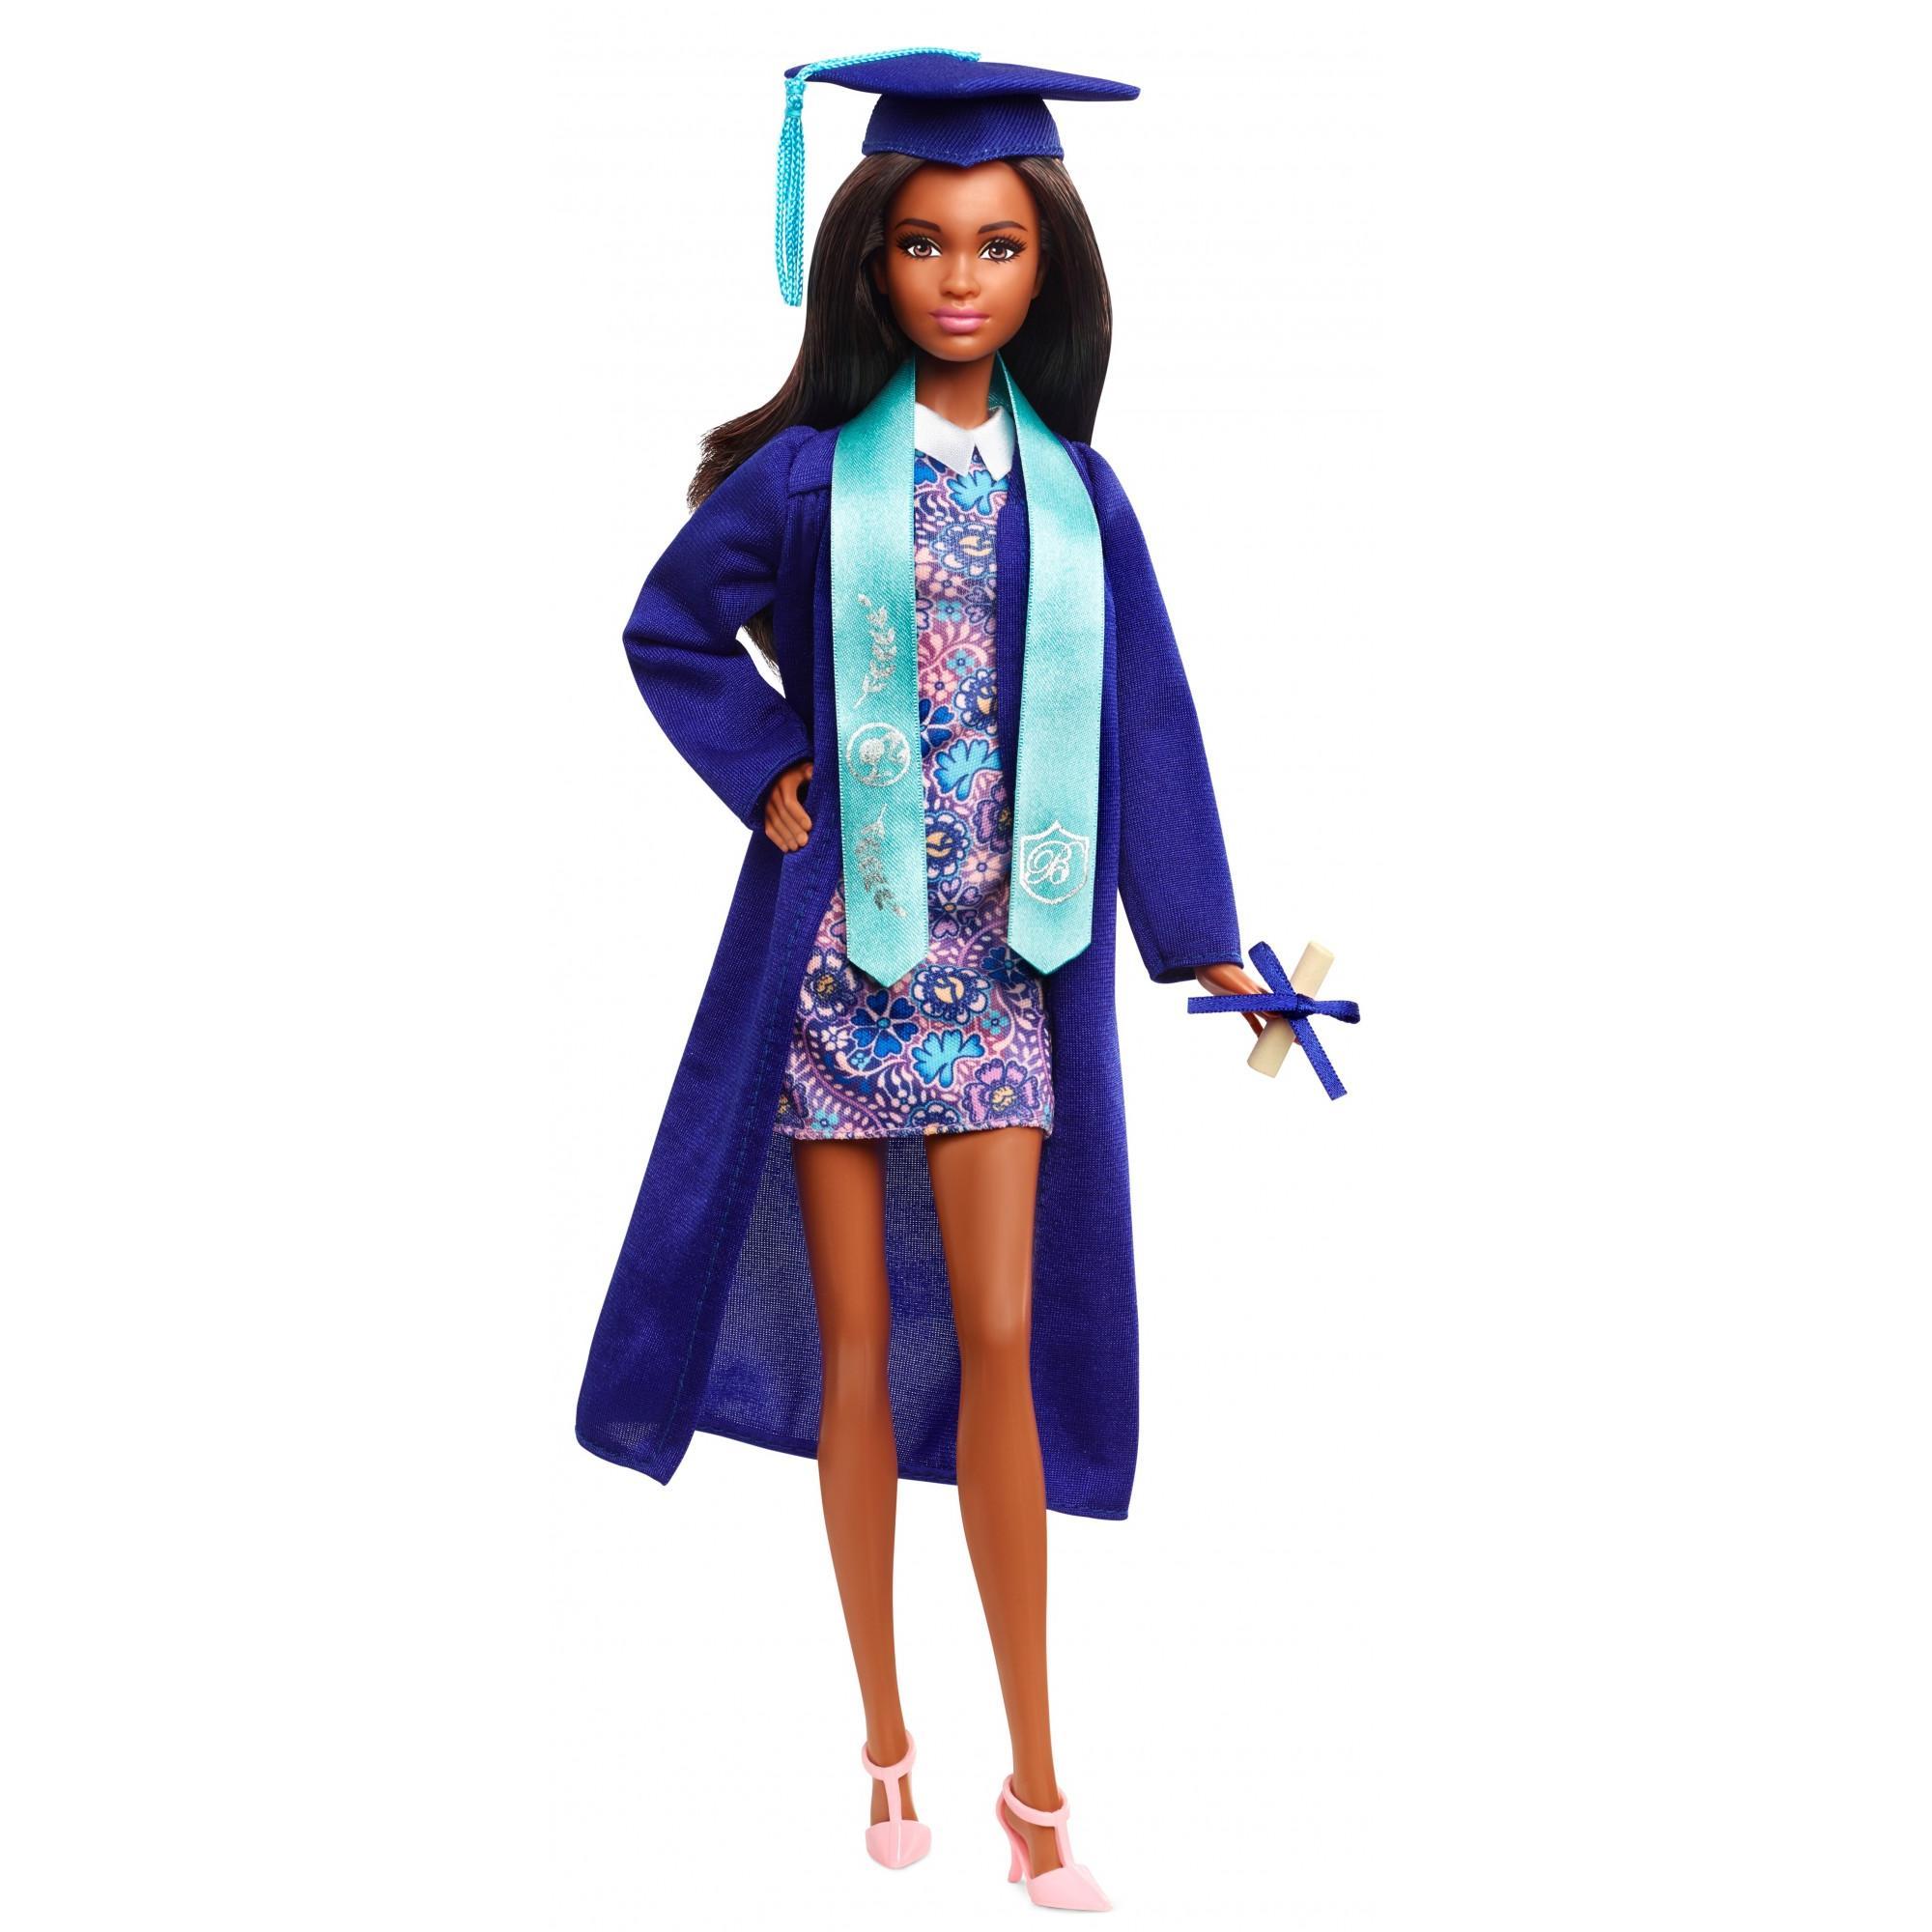 Barbie Graduation Day Doll, Brunette by Barbie